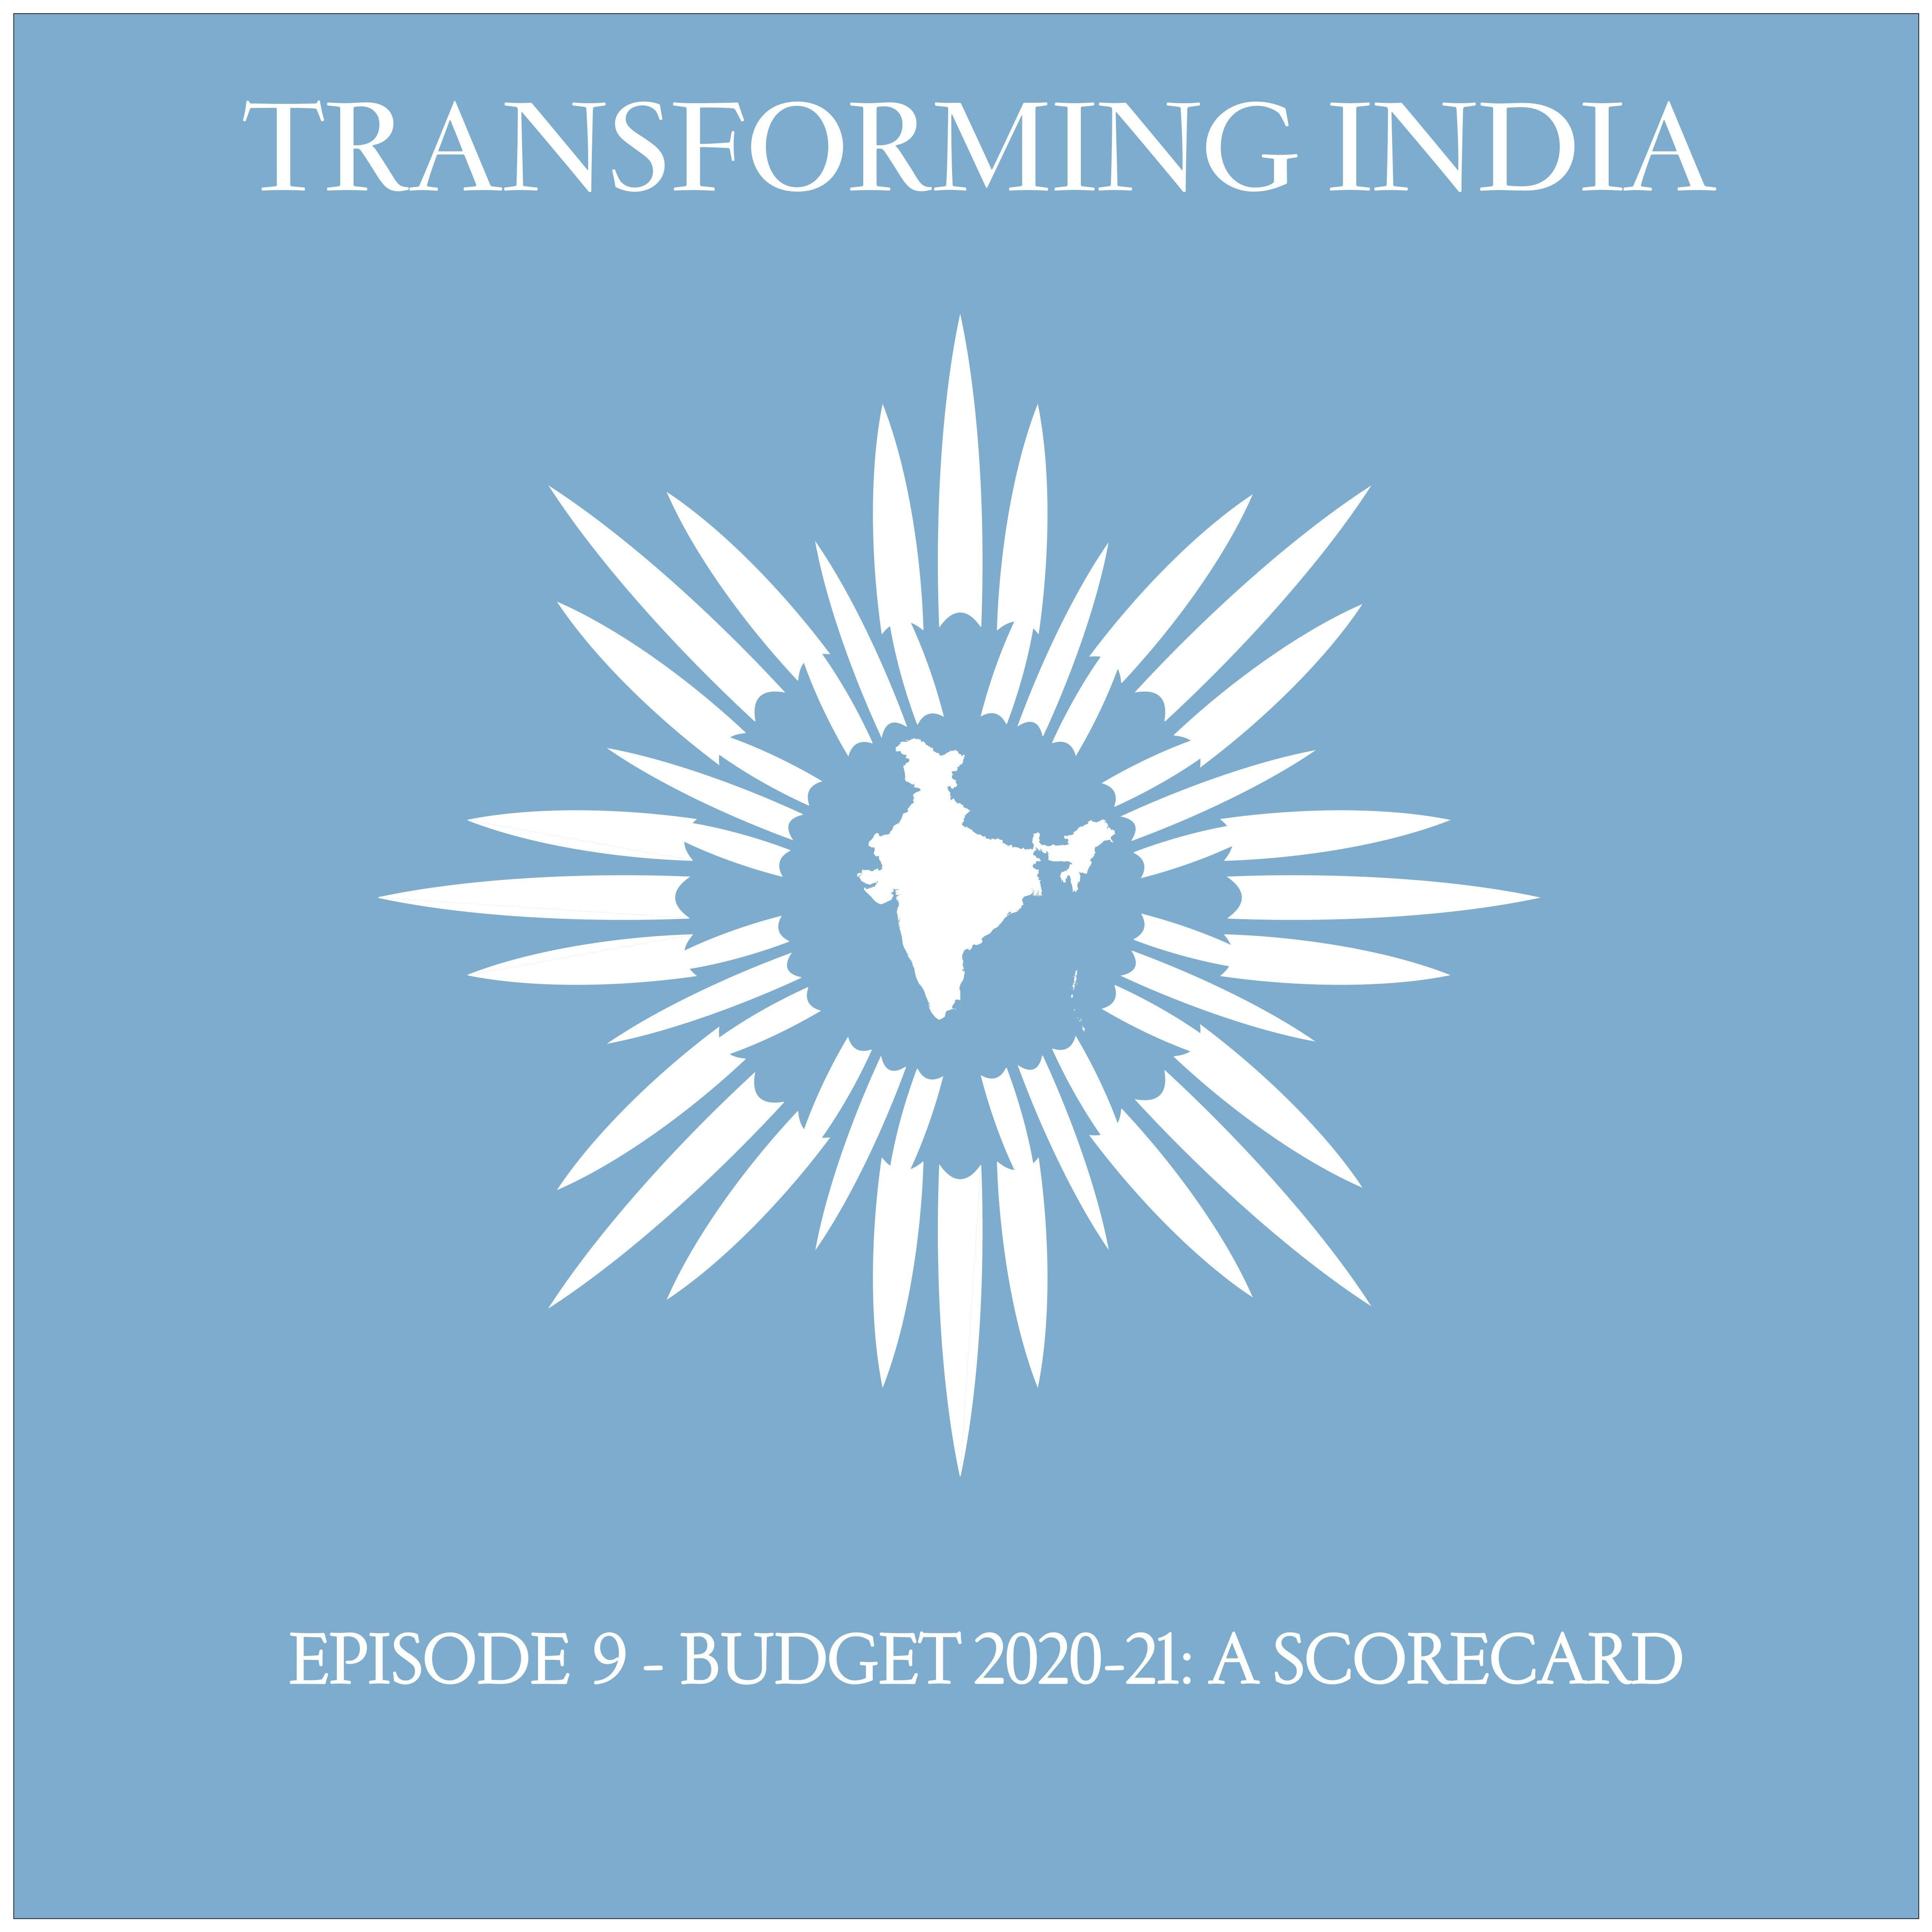 Episode 9: Budget 2020-21: A Scorecard